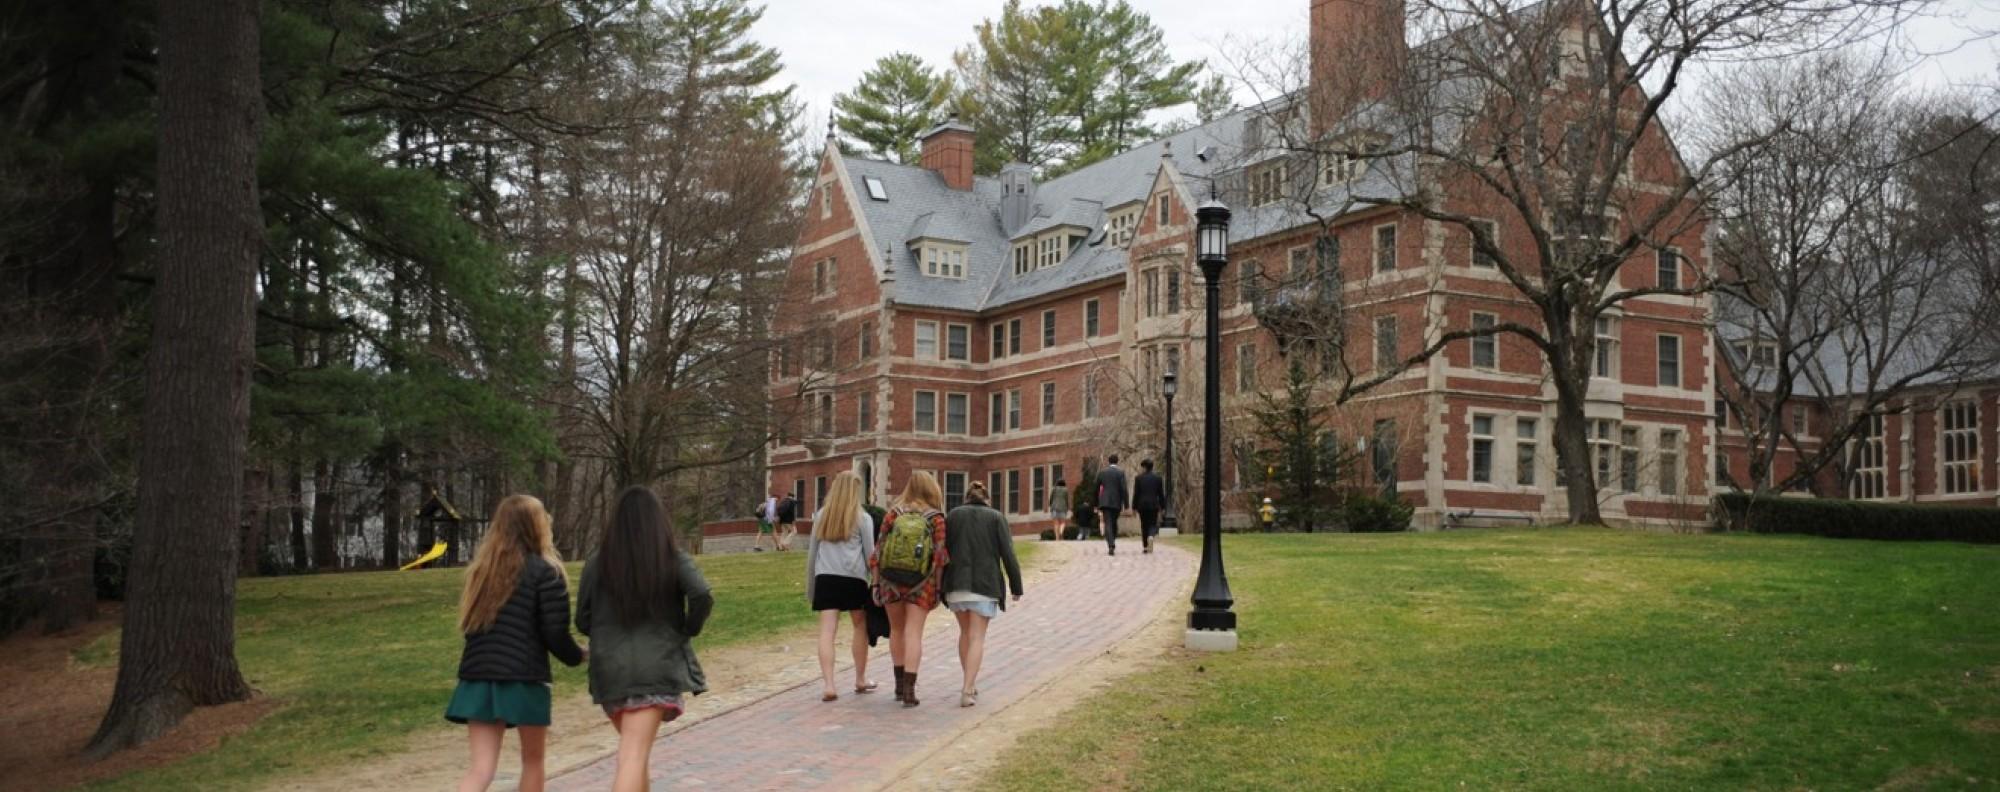 The prestigious St Paul's School, in Concord, New Hampshire, United States. Picture: St Paul's